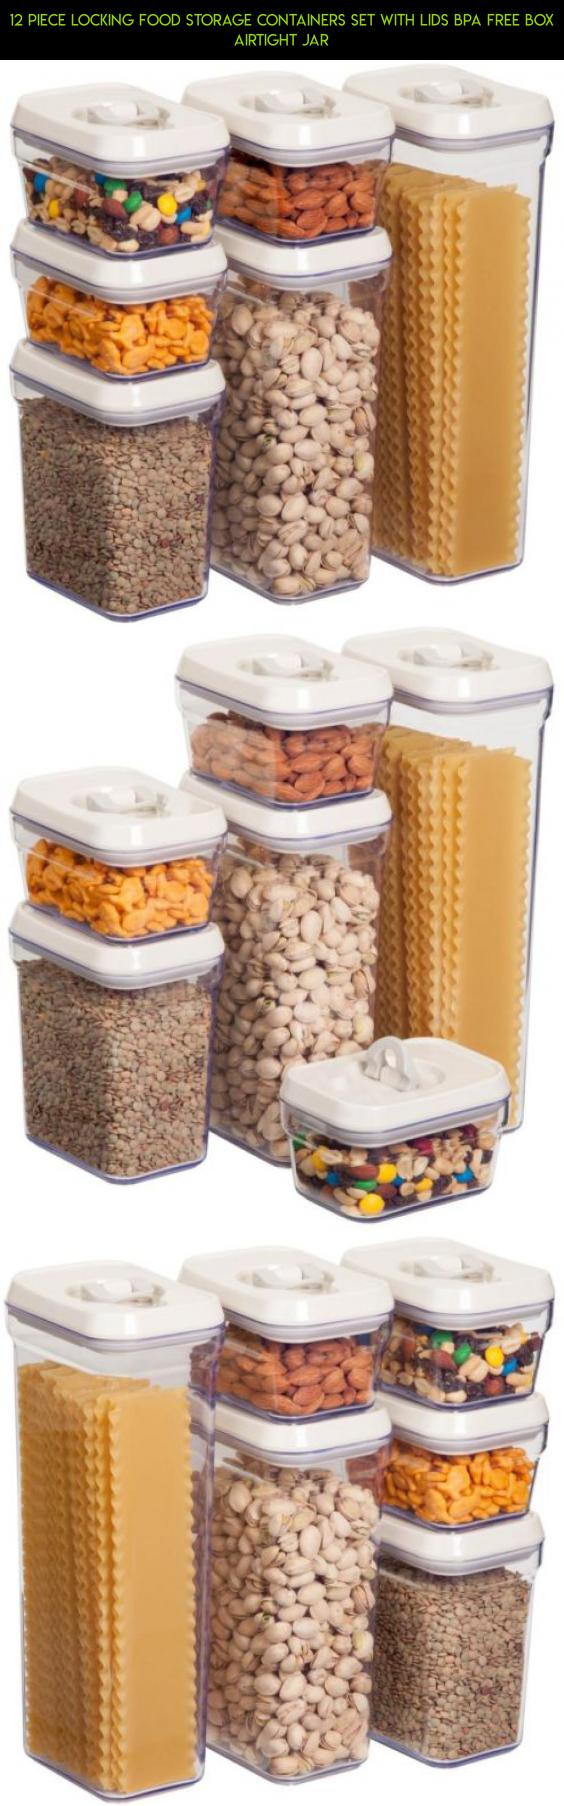 Beau 12 Piece Locking Food Storage Containers Set With Lids BPA Free Box  Airtight Jar #drone